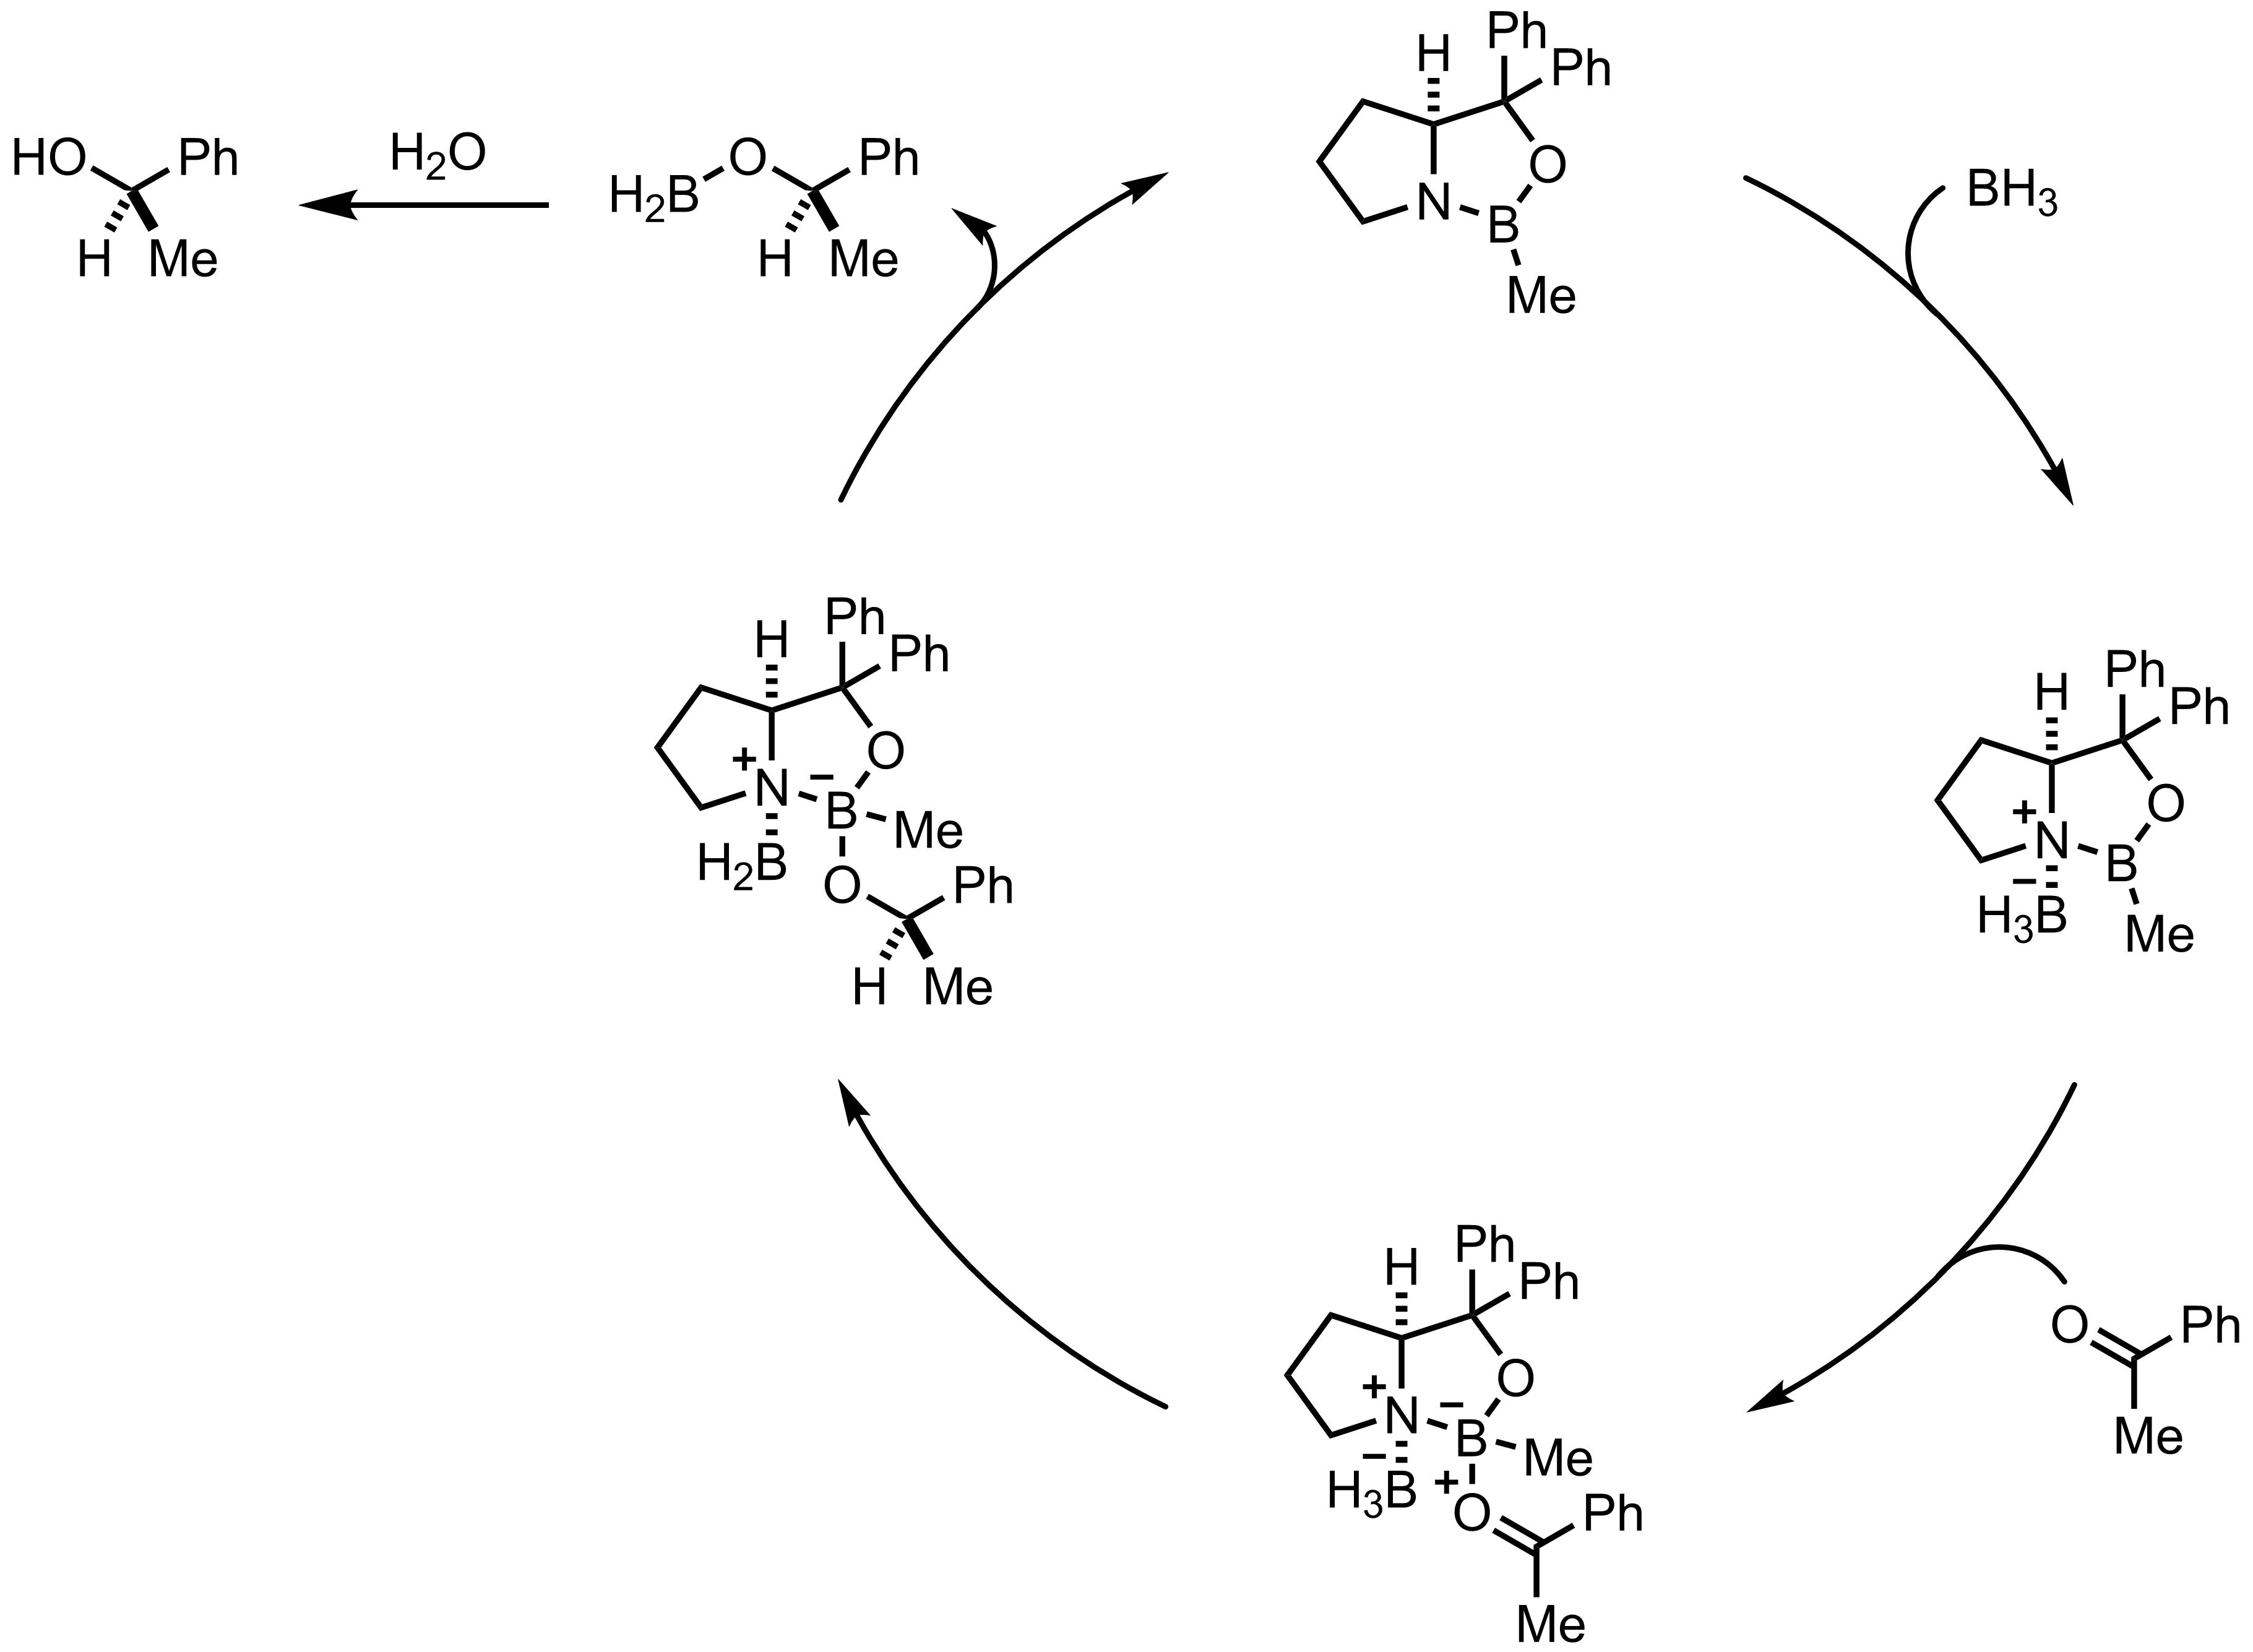 Mechanism of the Corey-Itsuno Reaction